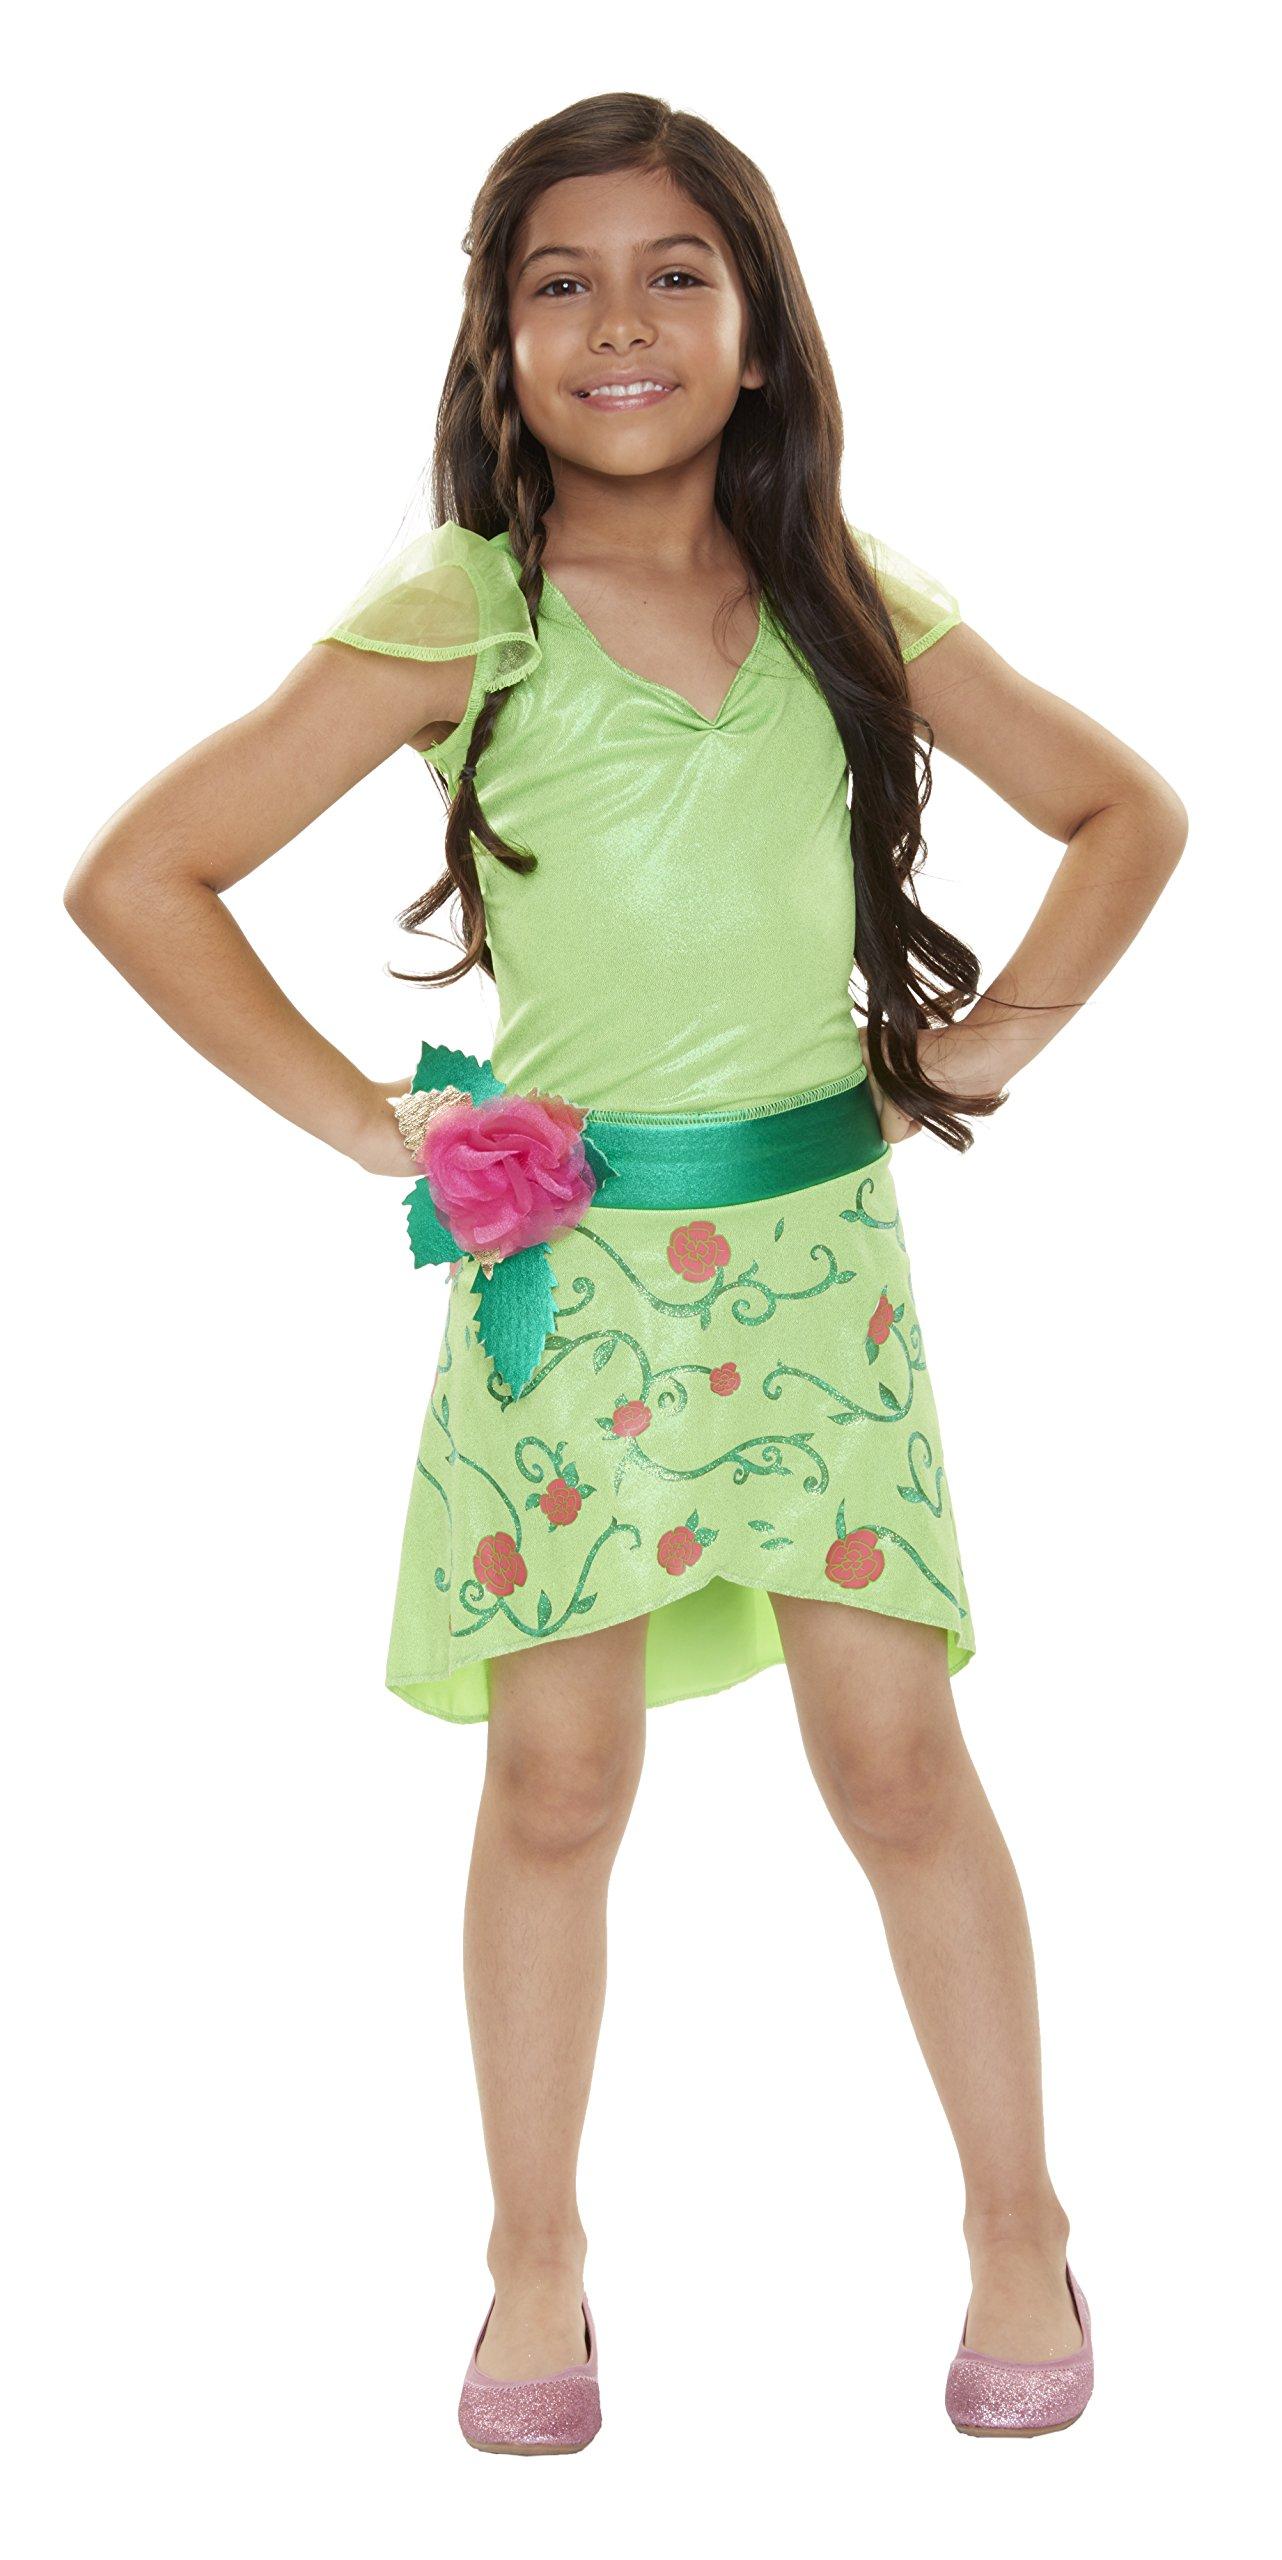 DC Super Hero Niñas 57358-eu Poison Ivy Everyday Disfraces Disfraz ...